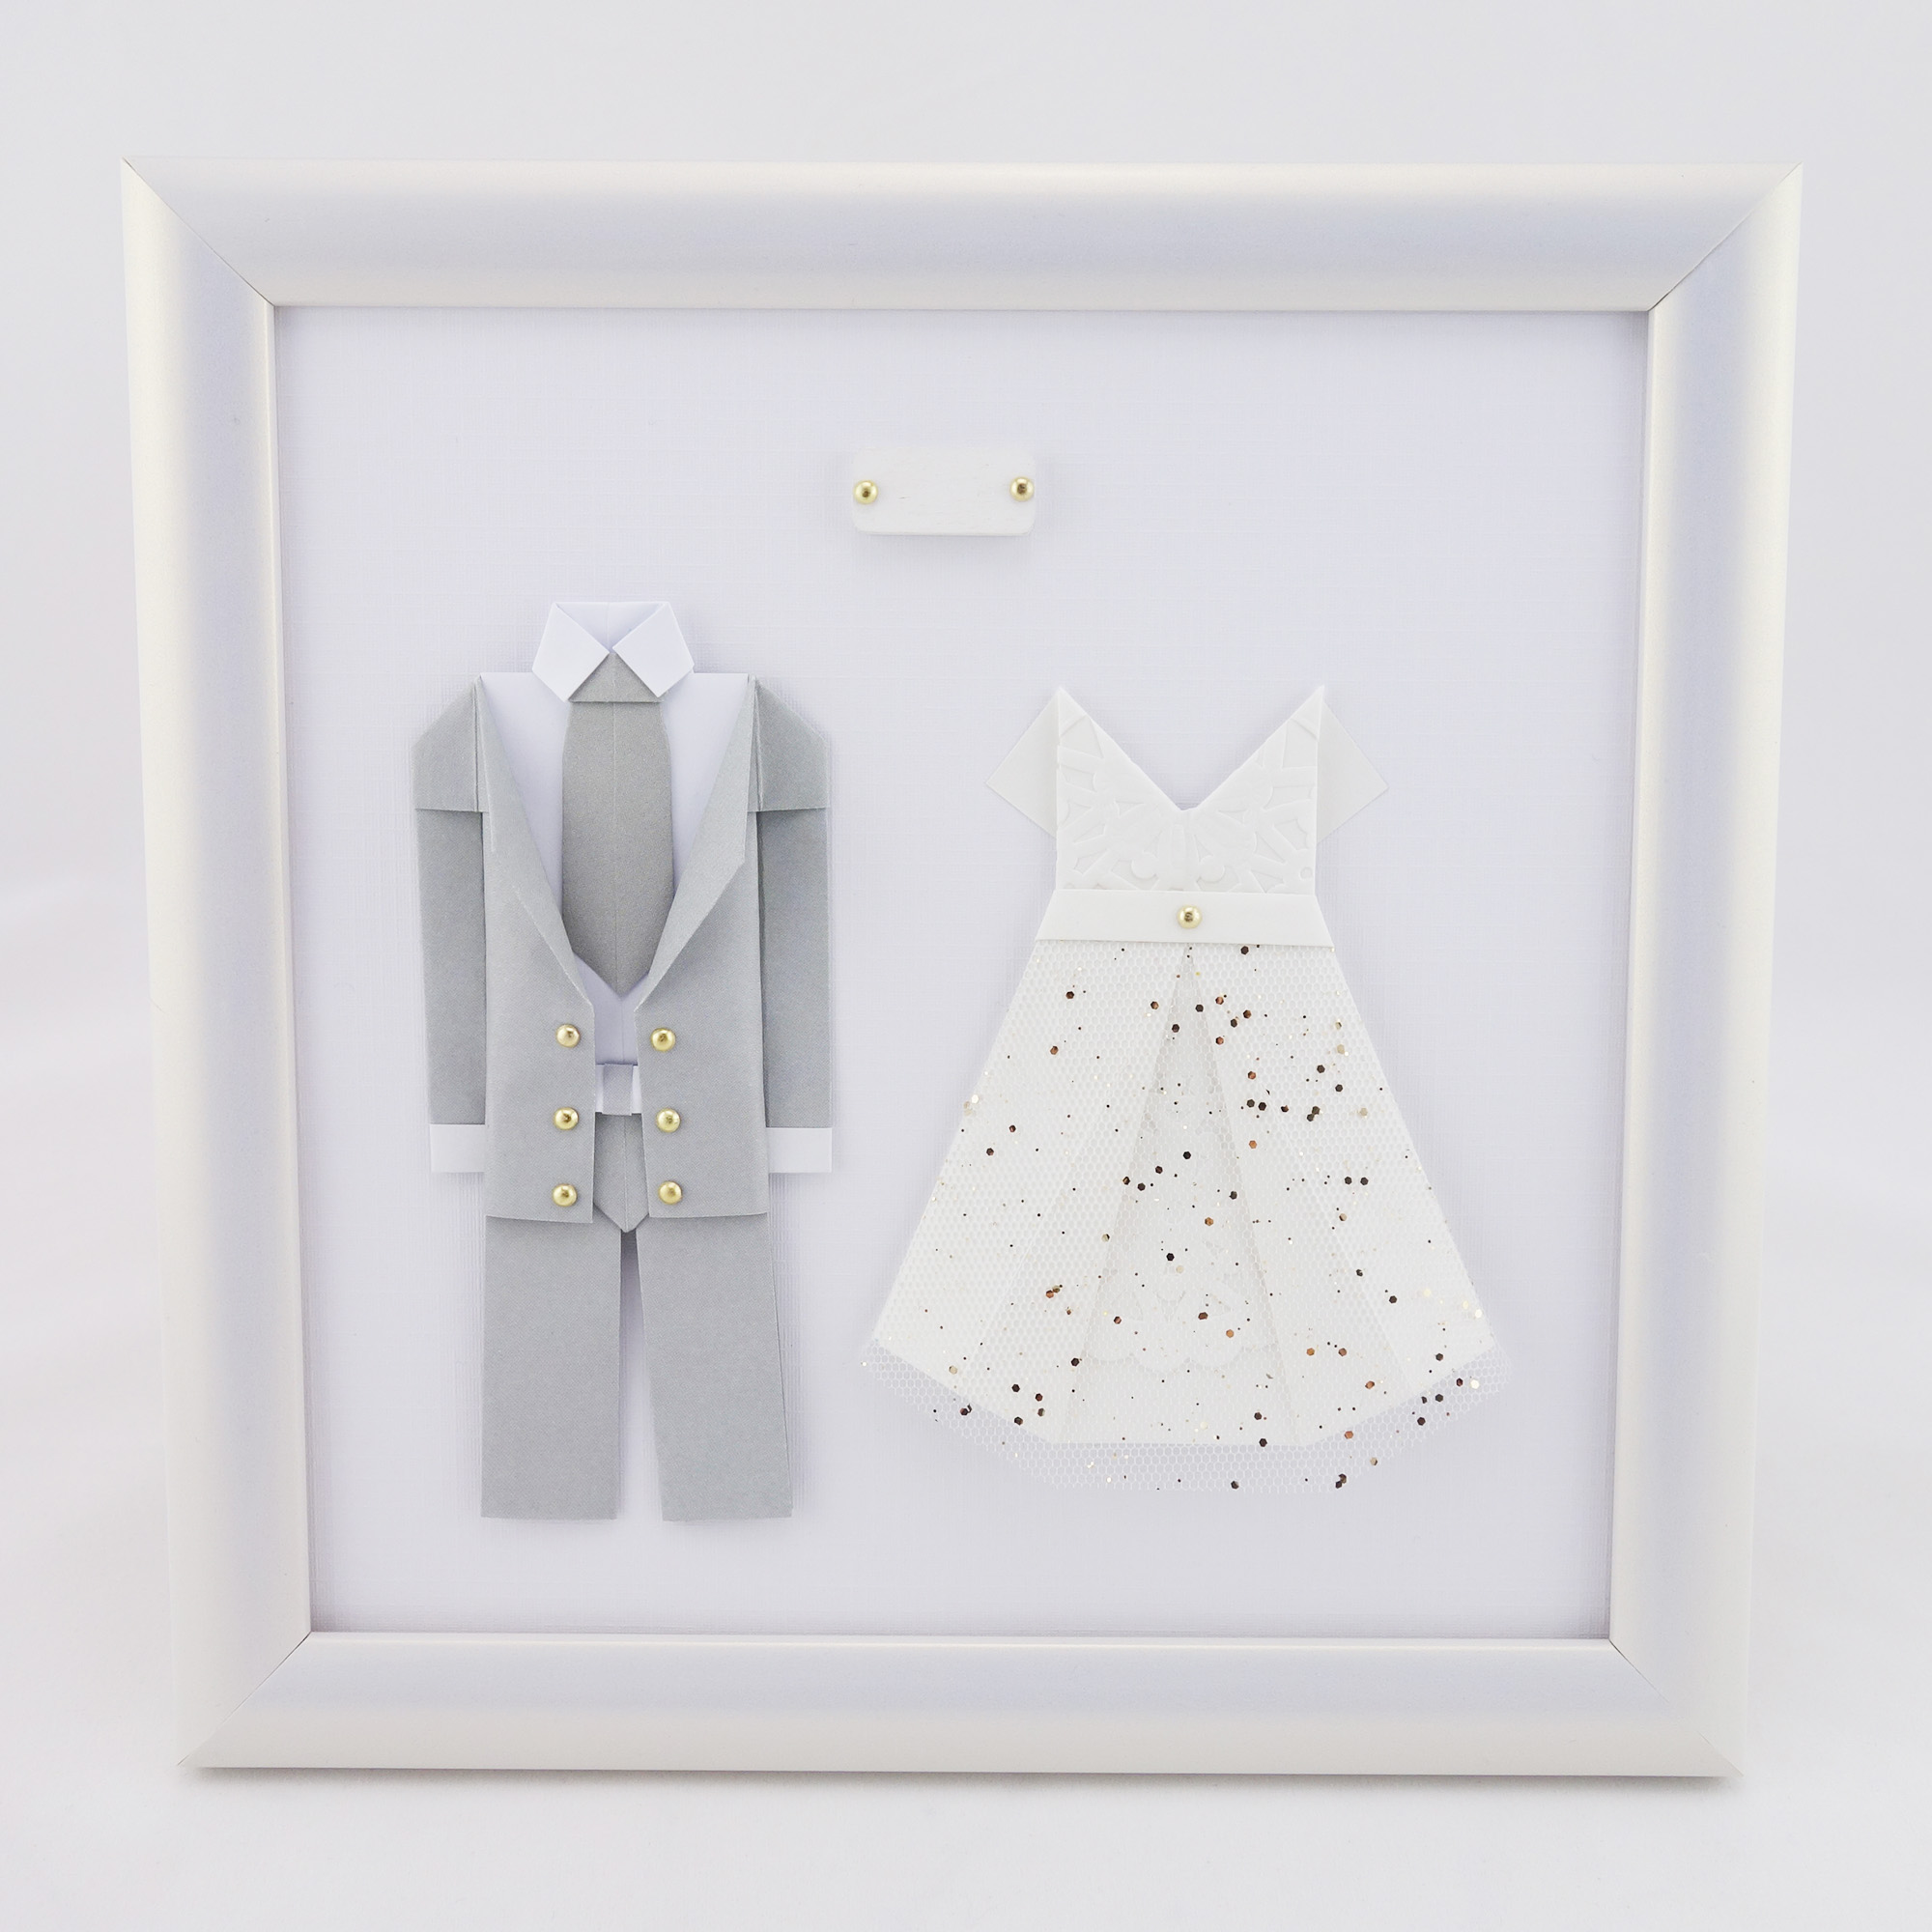 id e cadeau mariage cadeau couple original soligami. Black Bedroom Furniture Sets. Home Design Ideas